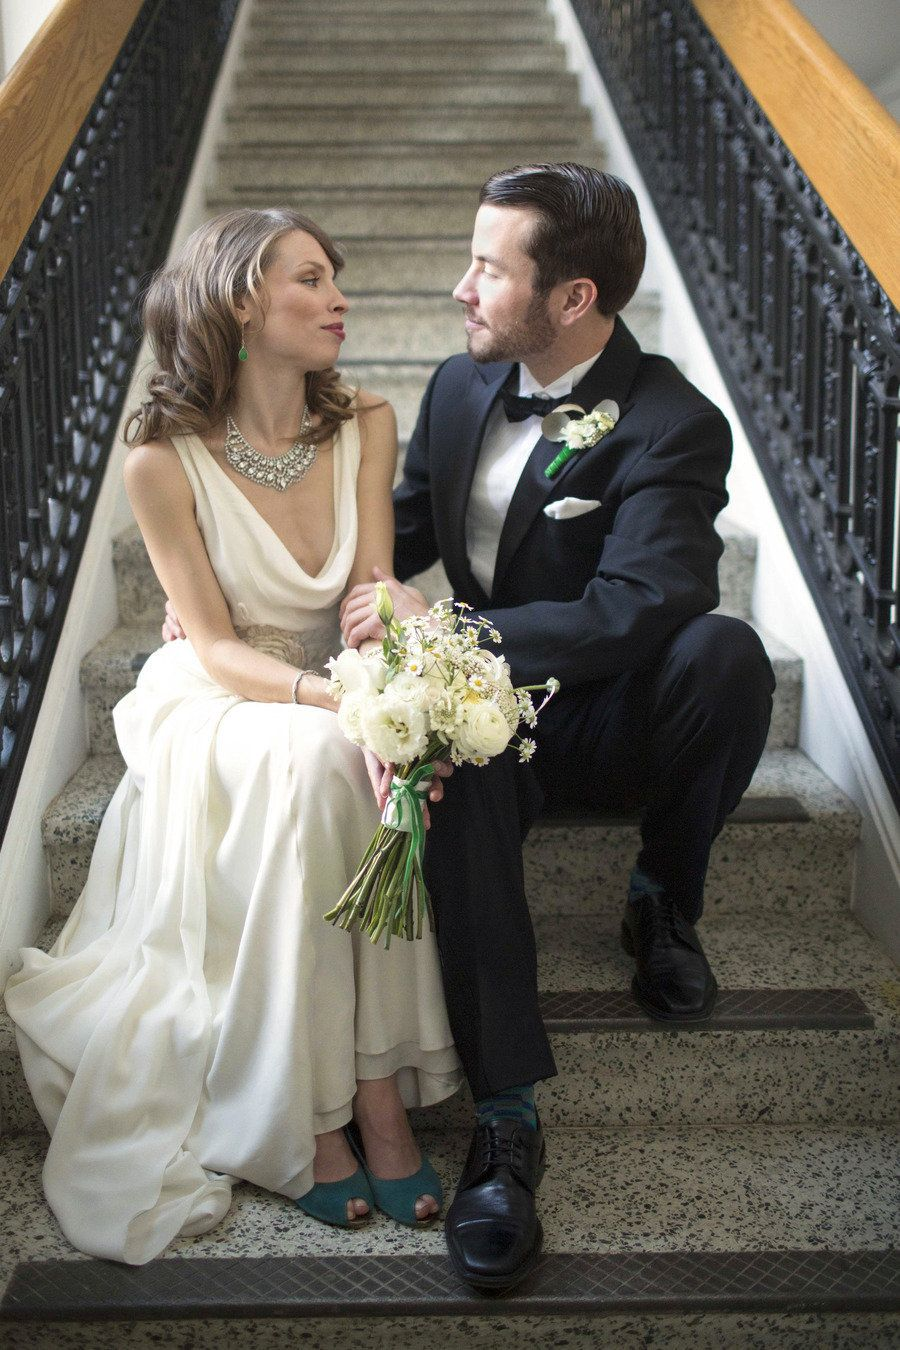 Emerald wedding dress   Emerald Inspired Photo Shoot from Rachel Gomez Photography